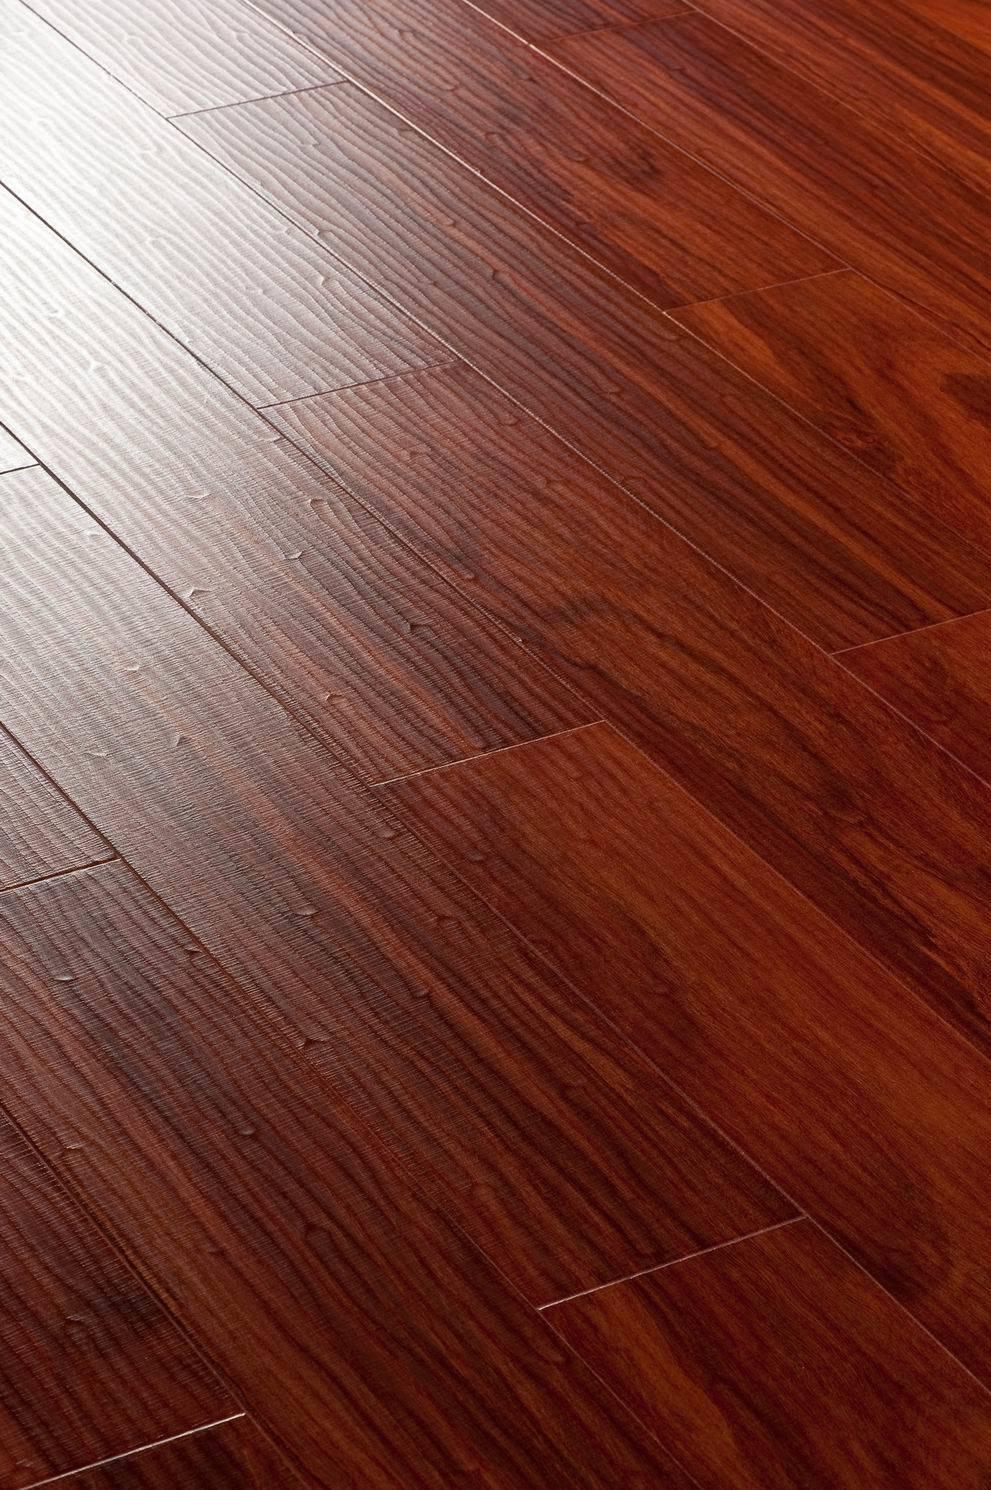 Flooring estimator hardwood flooring nc 18 flooring for Flooring estimator